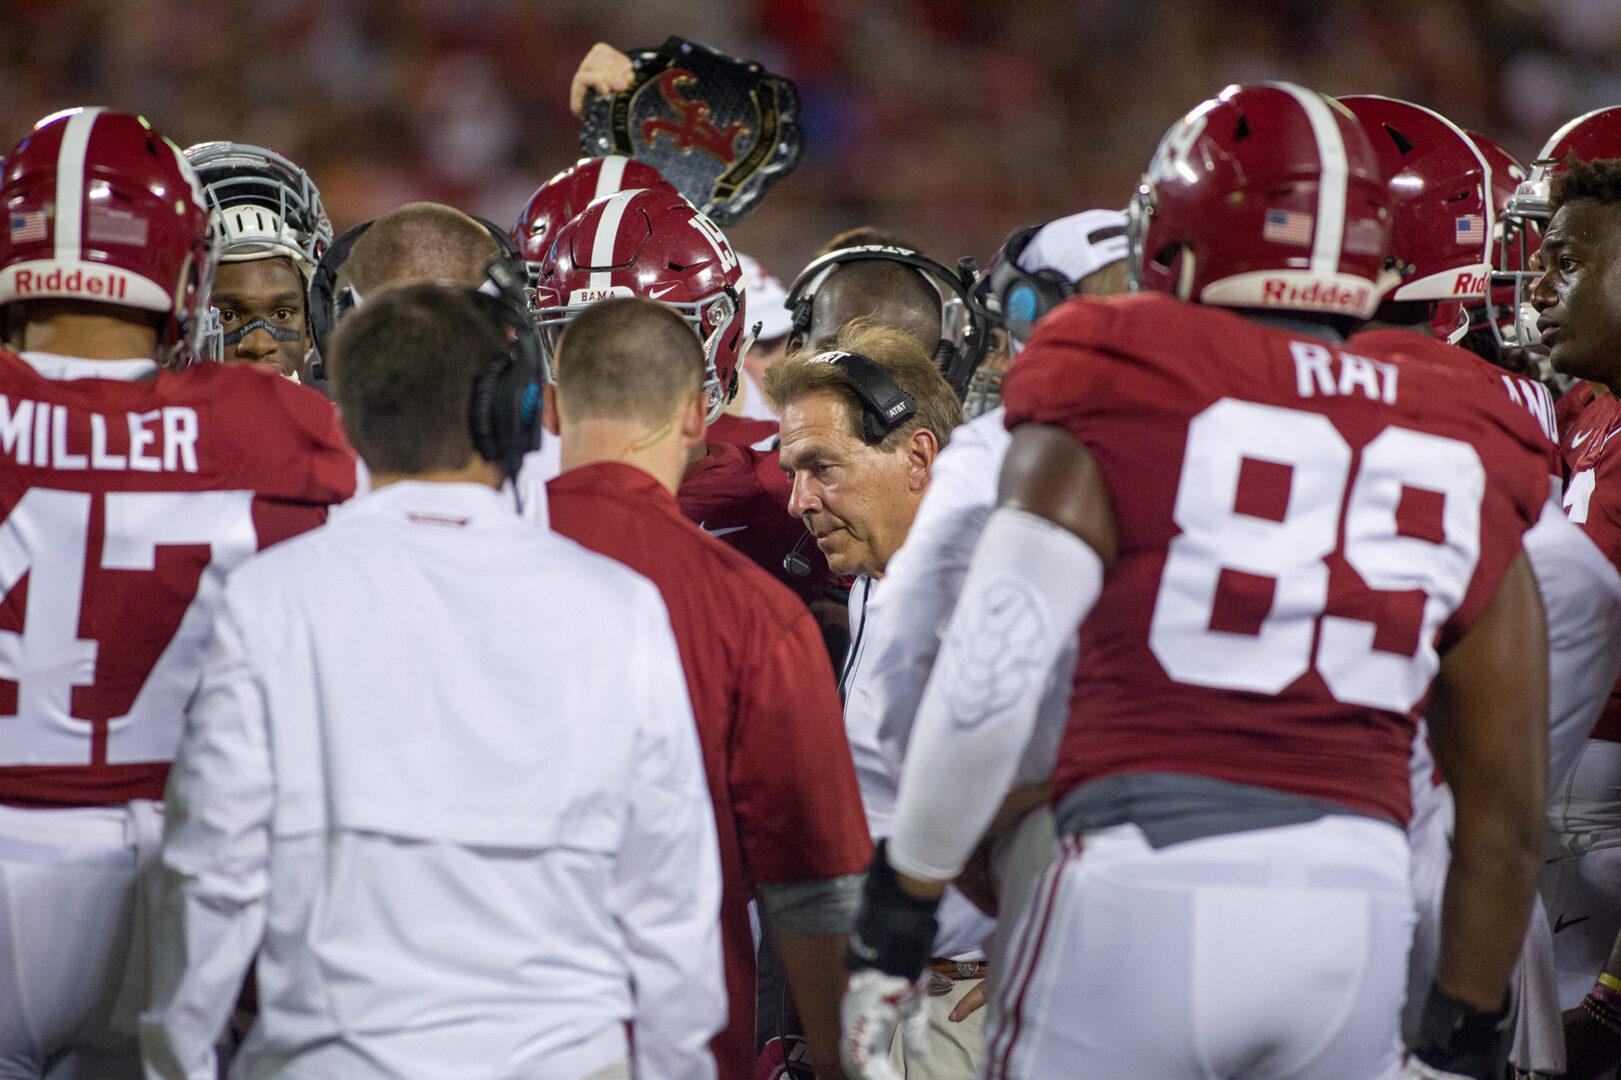 Ernie Johnson's Incredible Speech To Alabama Football Team Goes Viral (VIDEO)